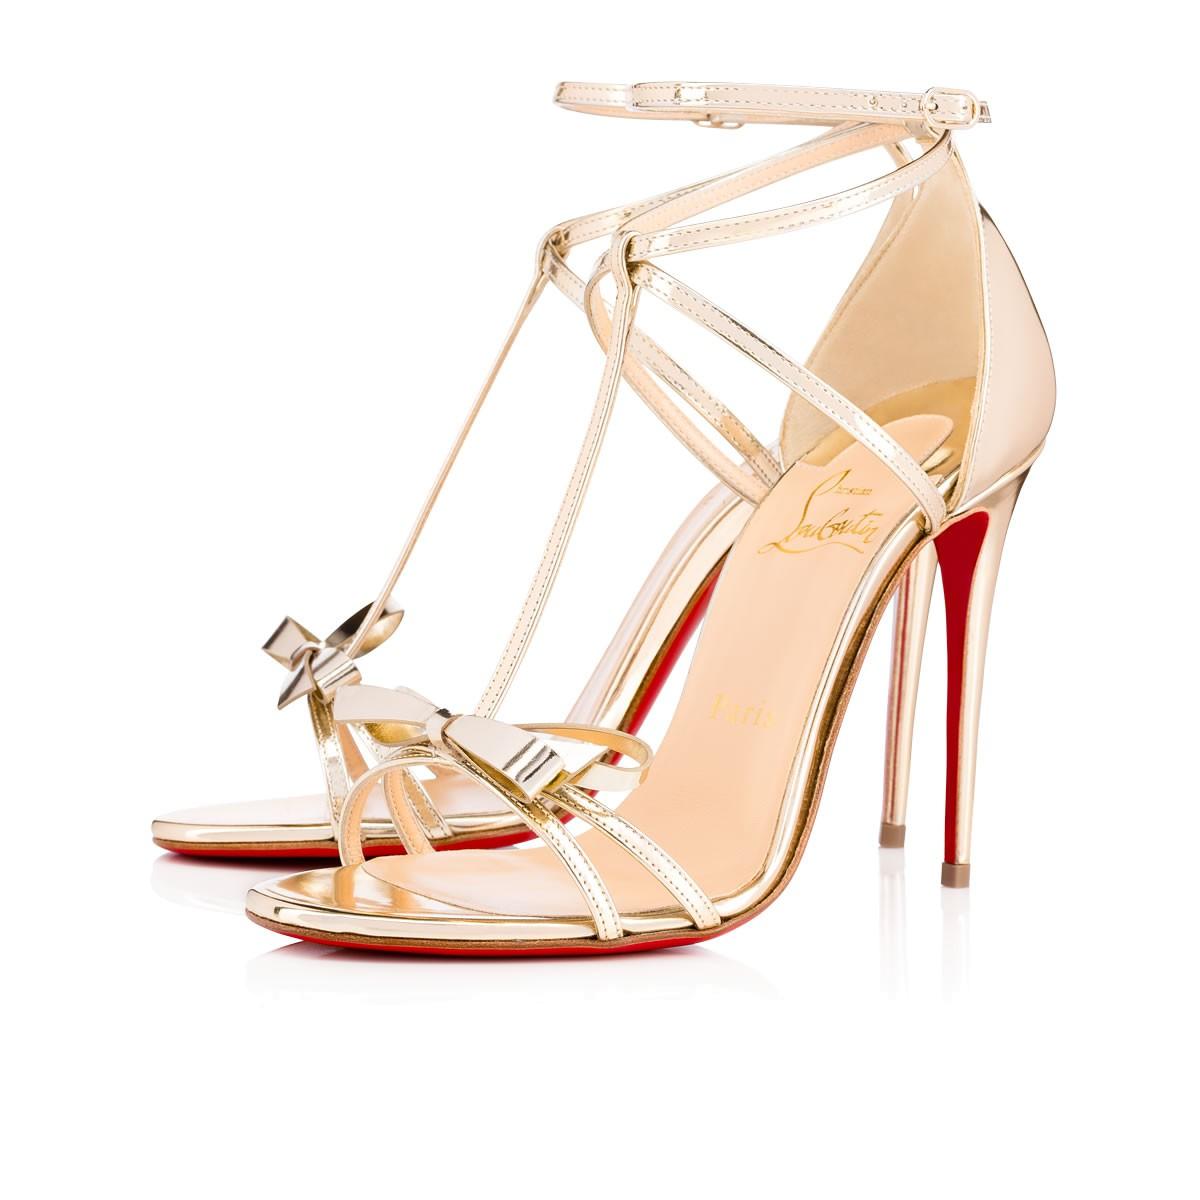 b16b887e831c Christian Louboutin Blakissima Patent 85 Poudre Patent Calfskin - Women  Shoes - In Platine